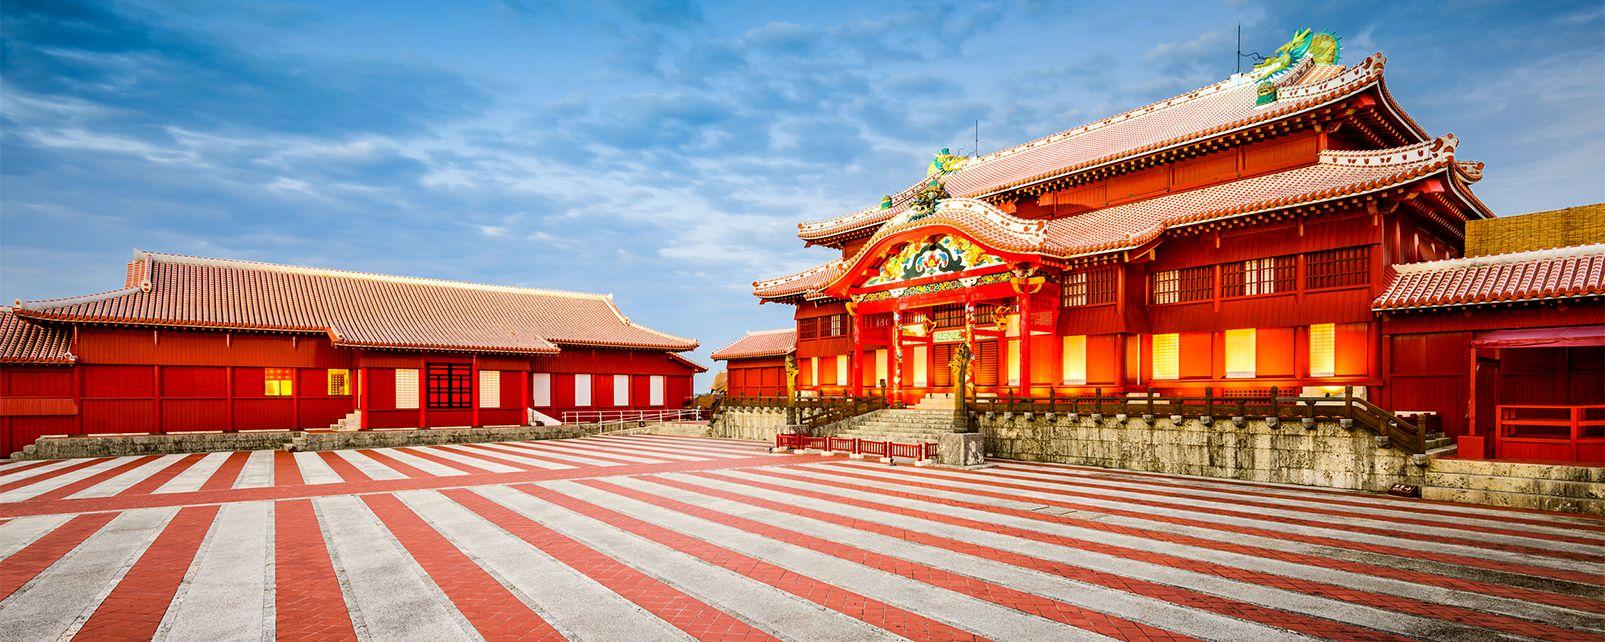 Les sites Gusuku à Okinawa , Japon